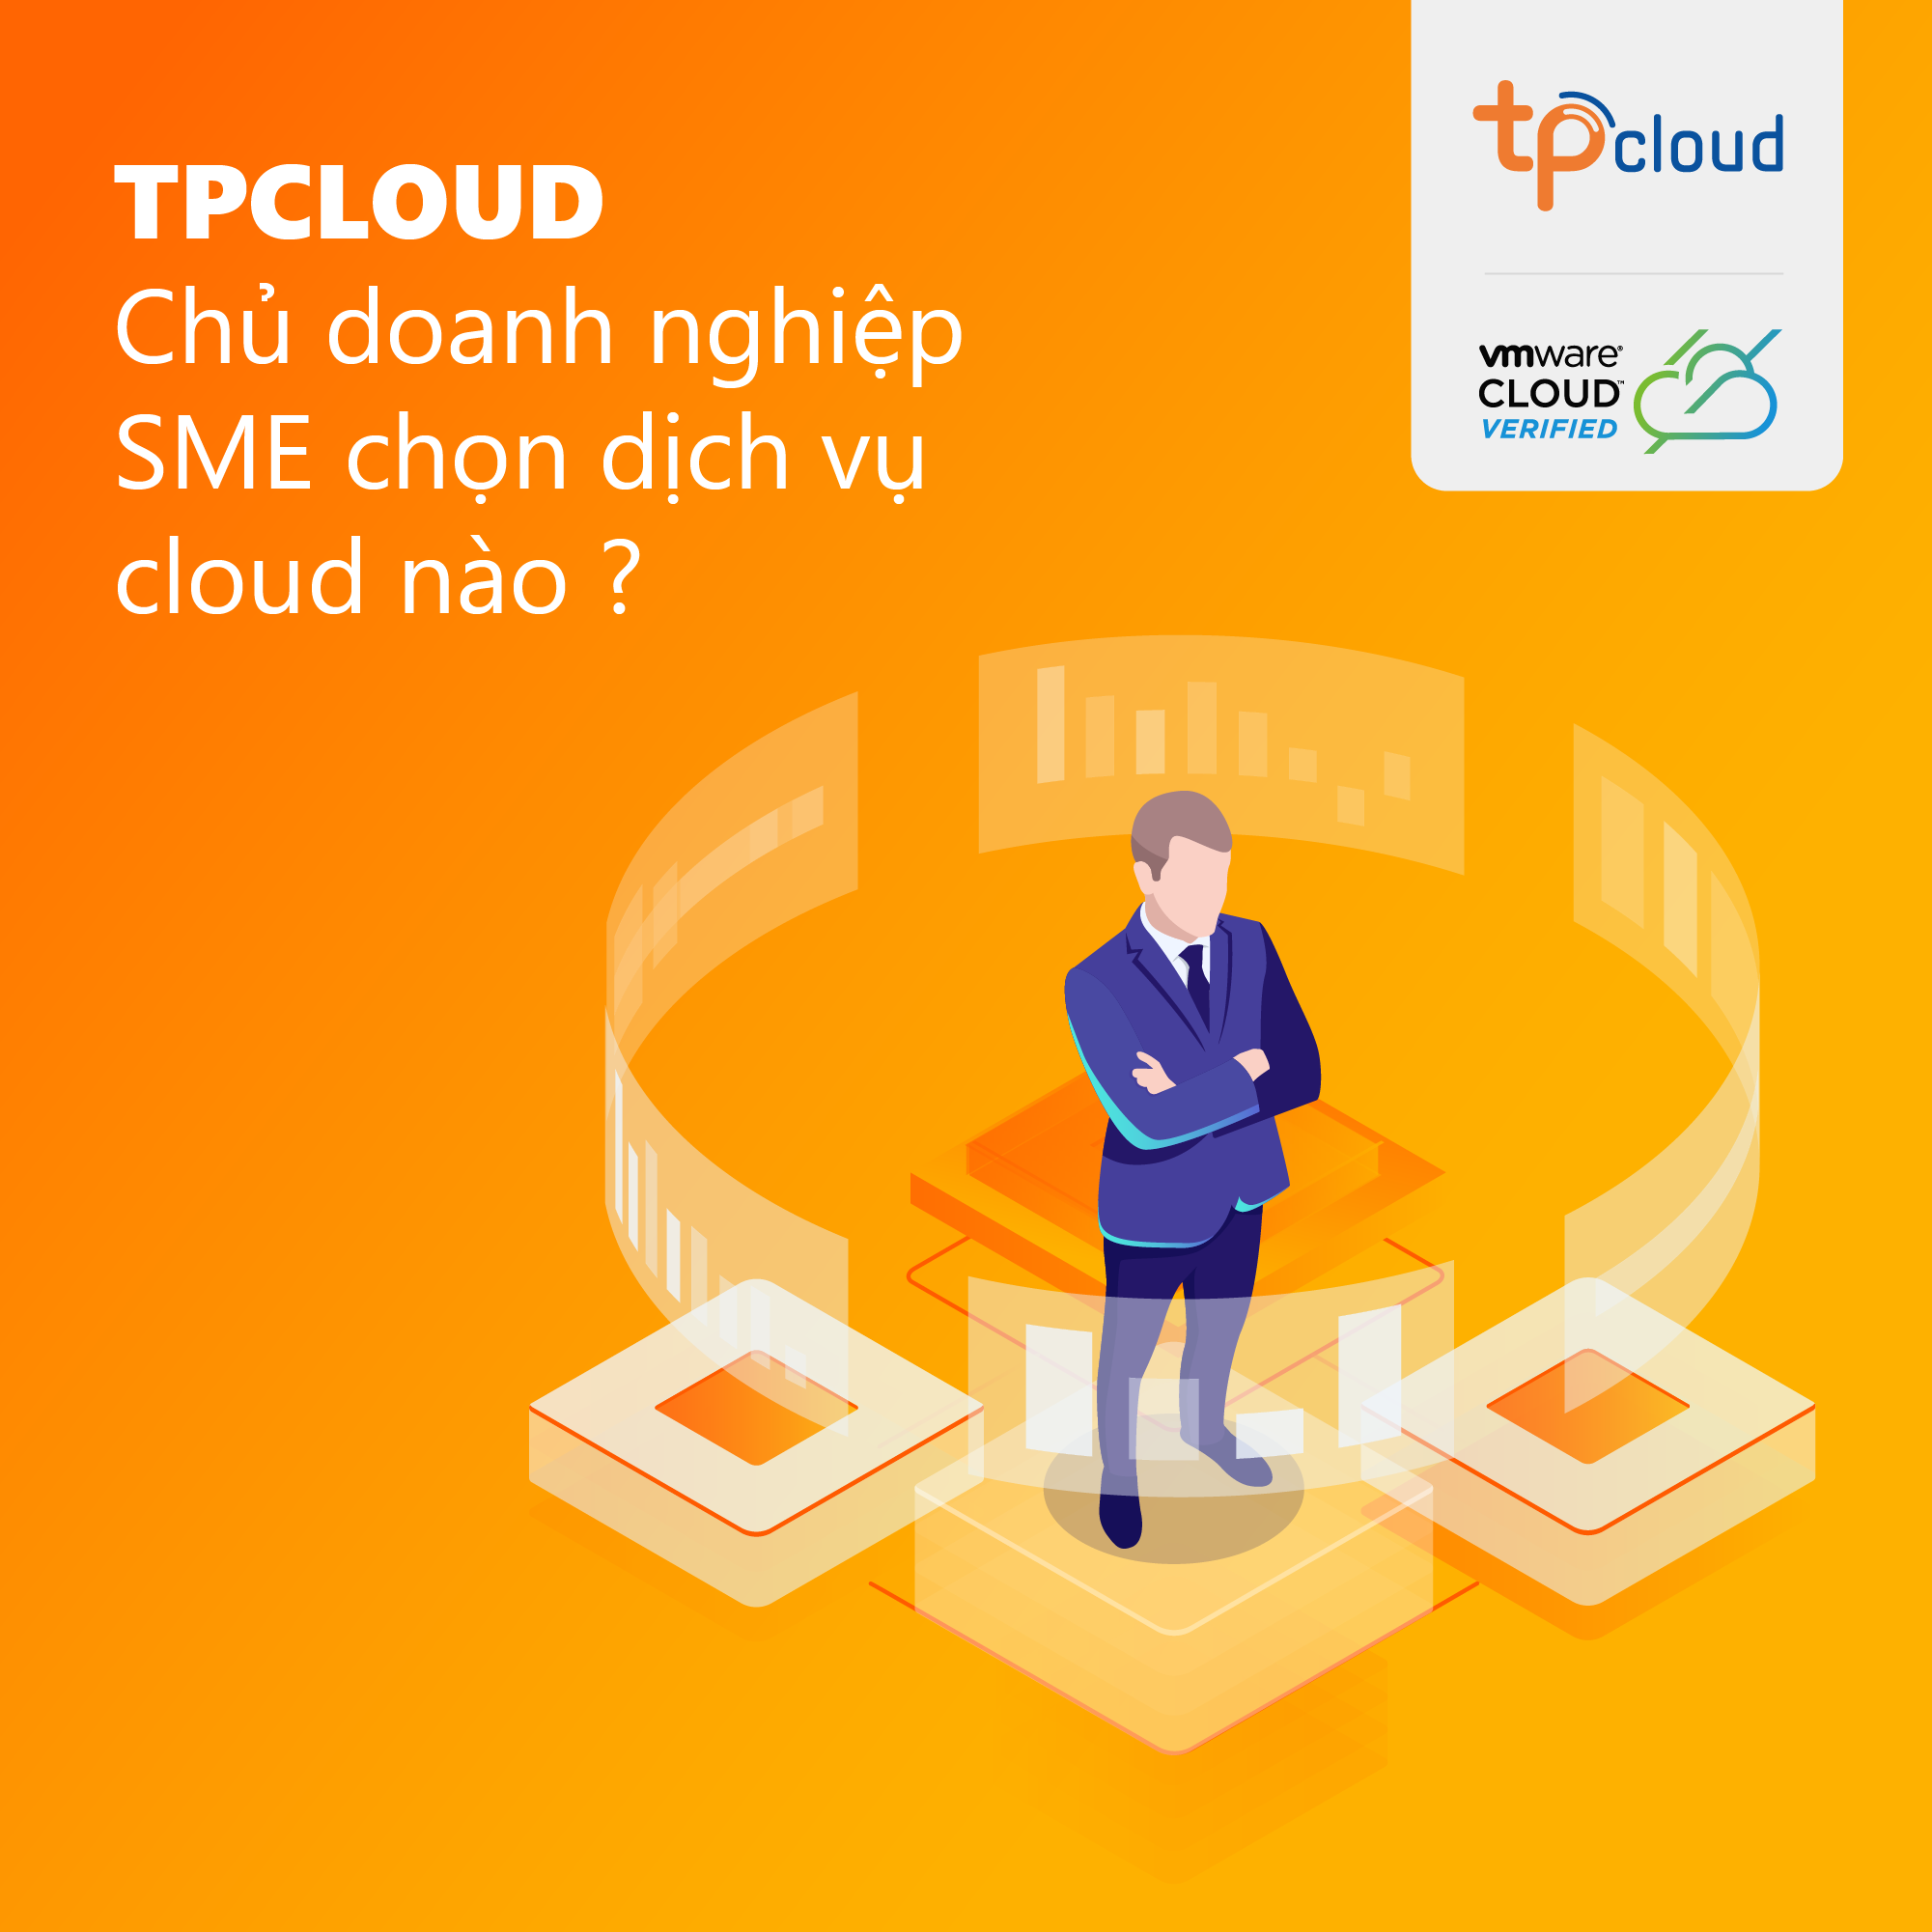 chon-dich-vu-cloud-server-nao-cho-doanh-nghiep-sme